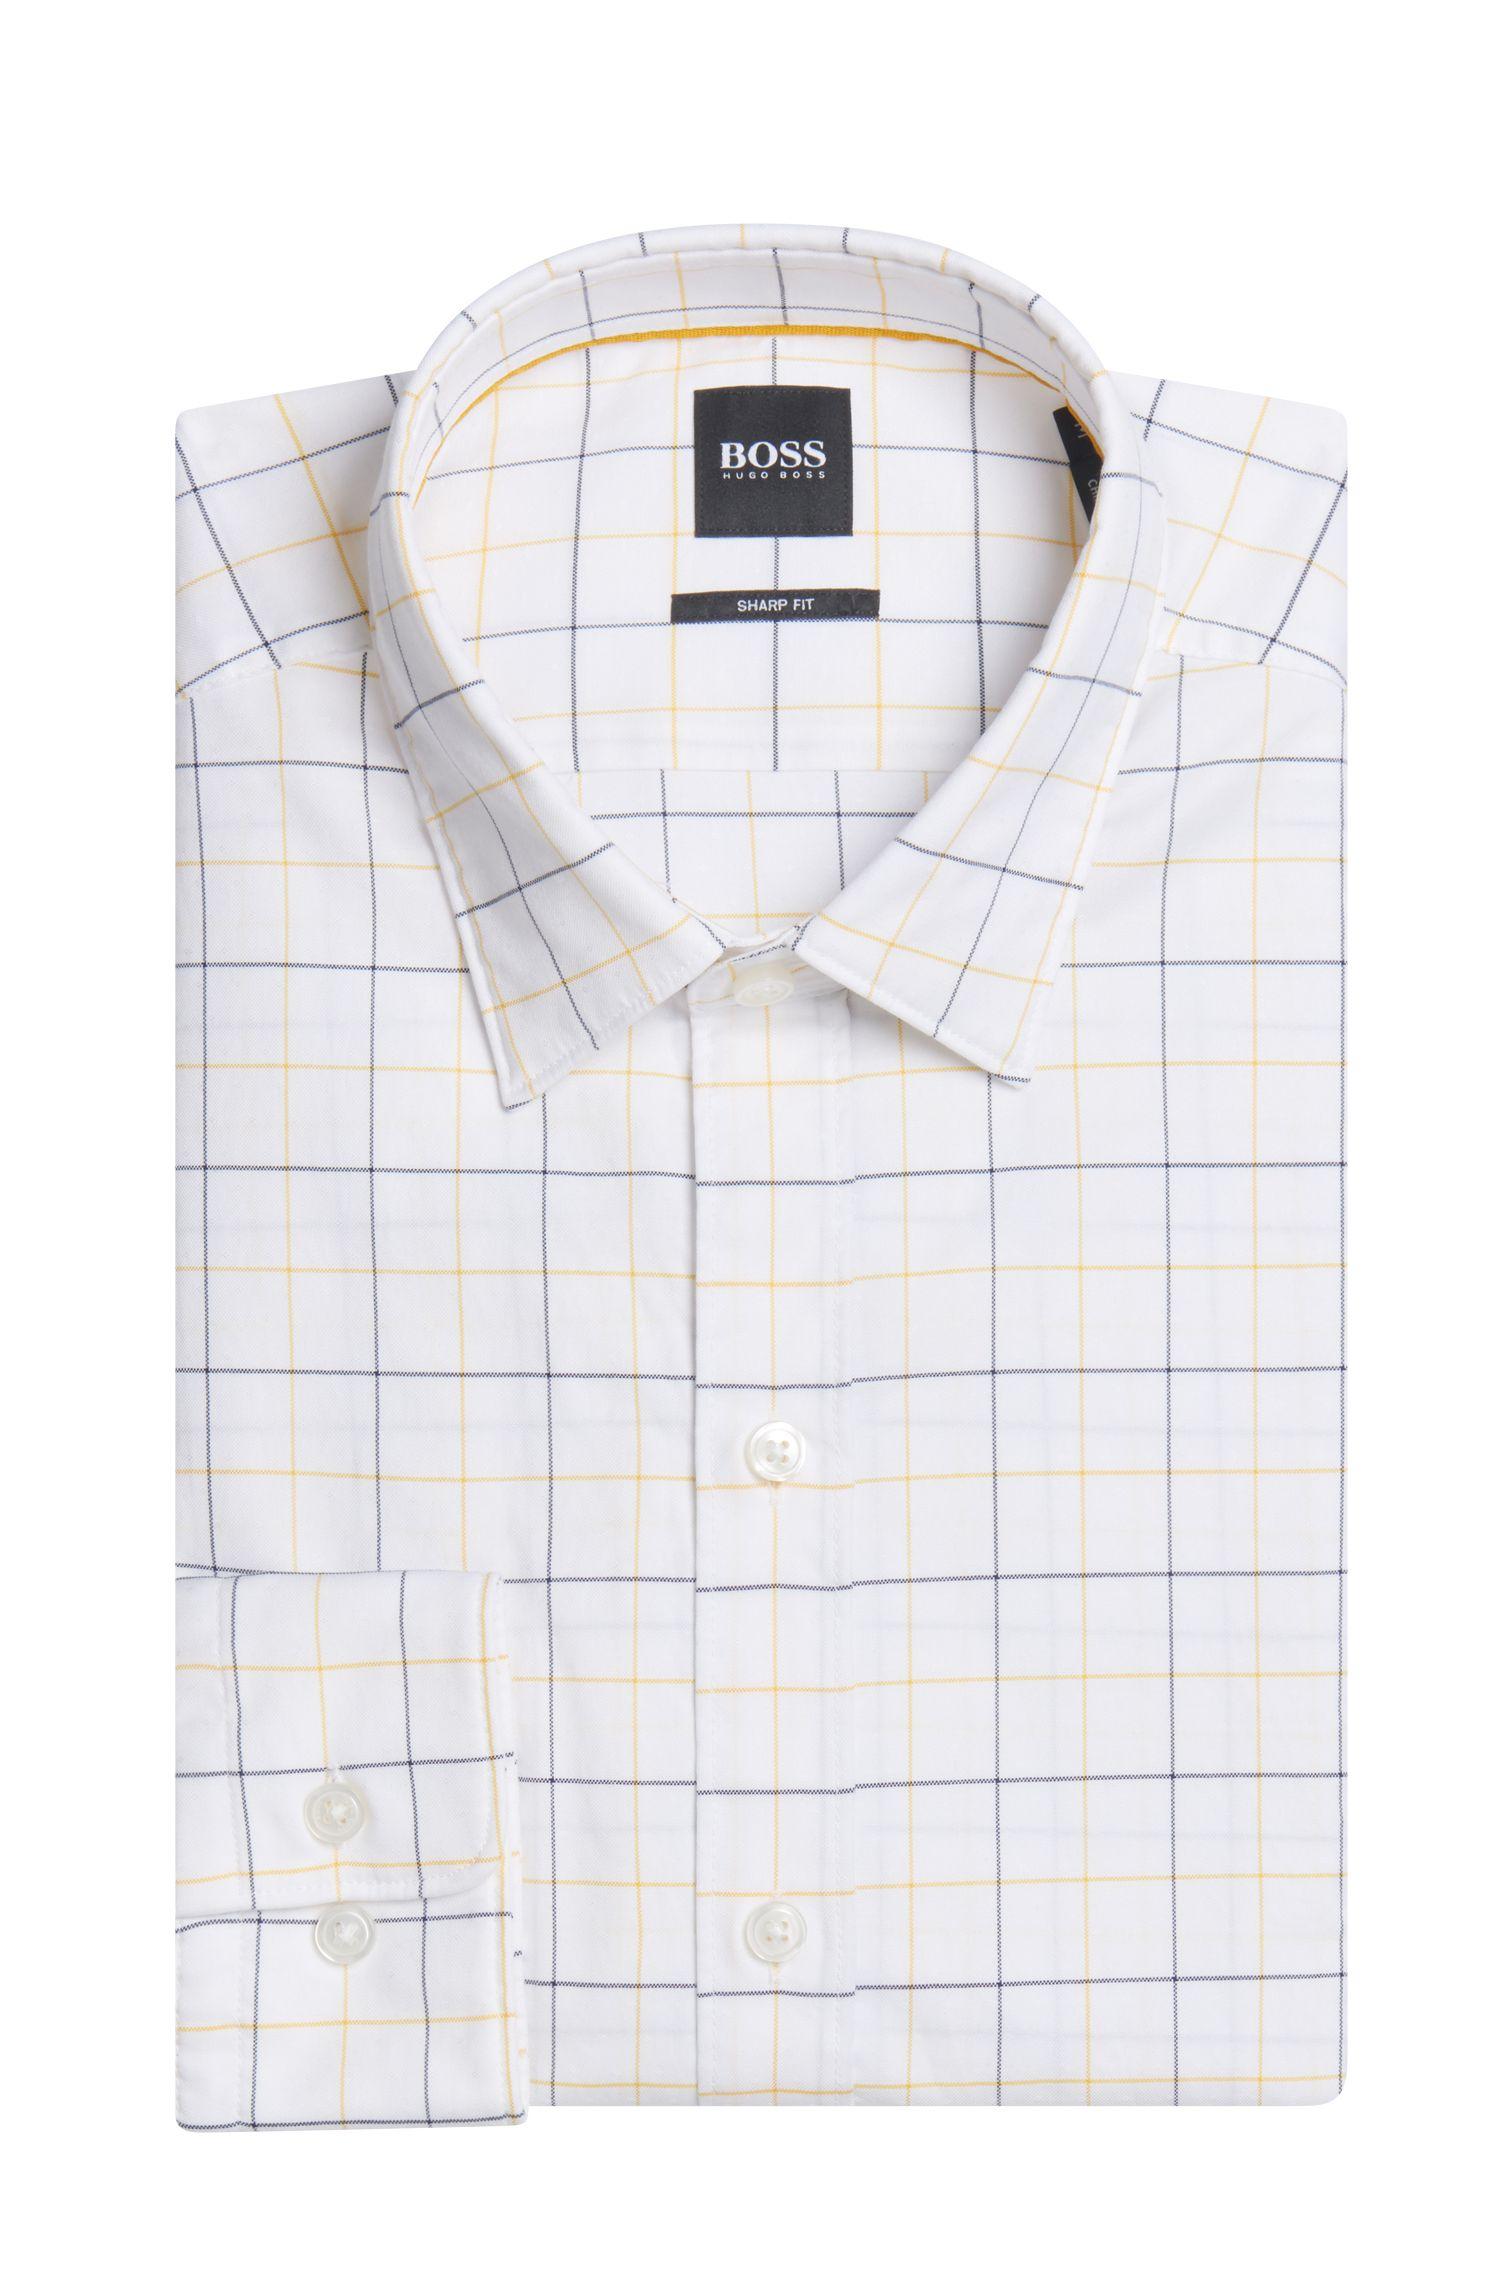 Plaid Cotton Sport Shirt, Sharp Fit    Robbie, Gold